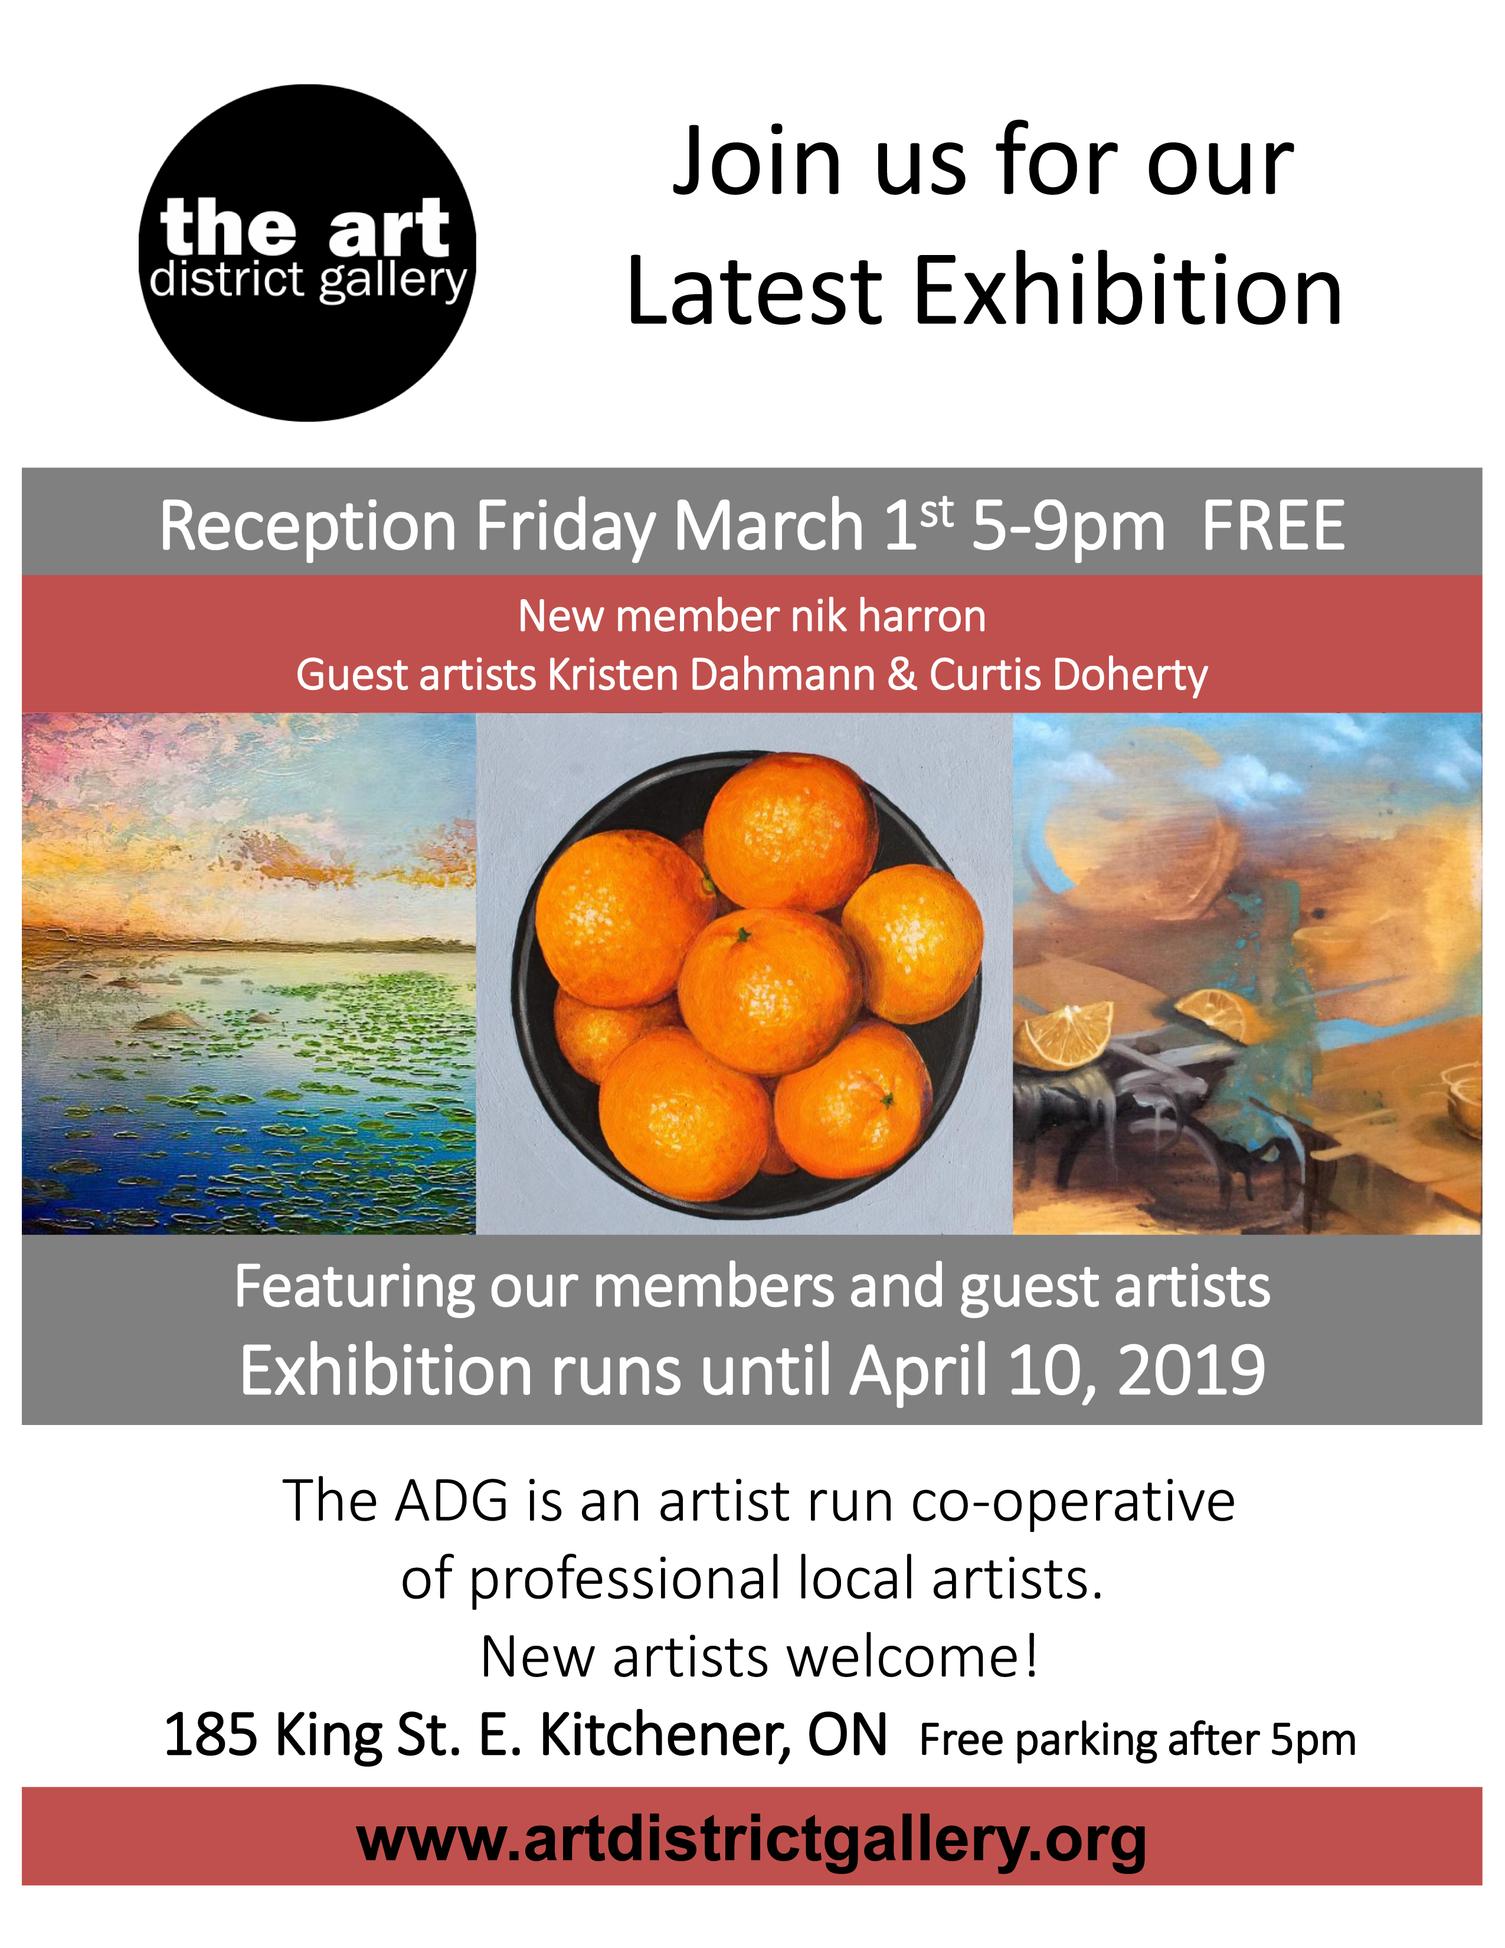 Art District Gallery - Reception March 1, 2019Show runs until April 10, 2019